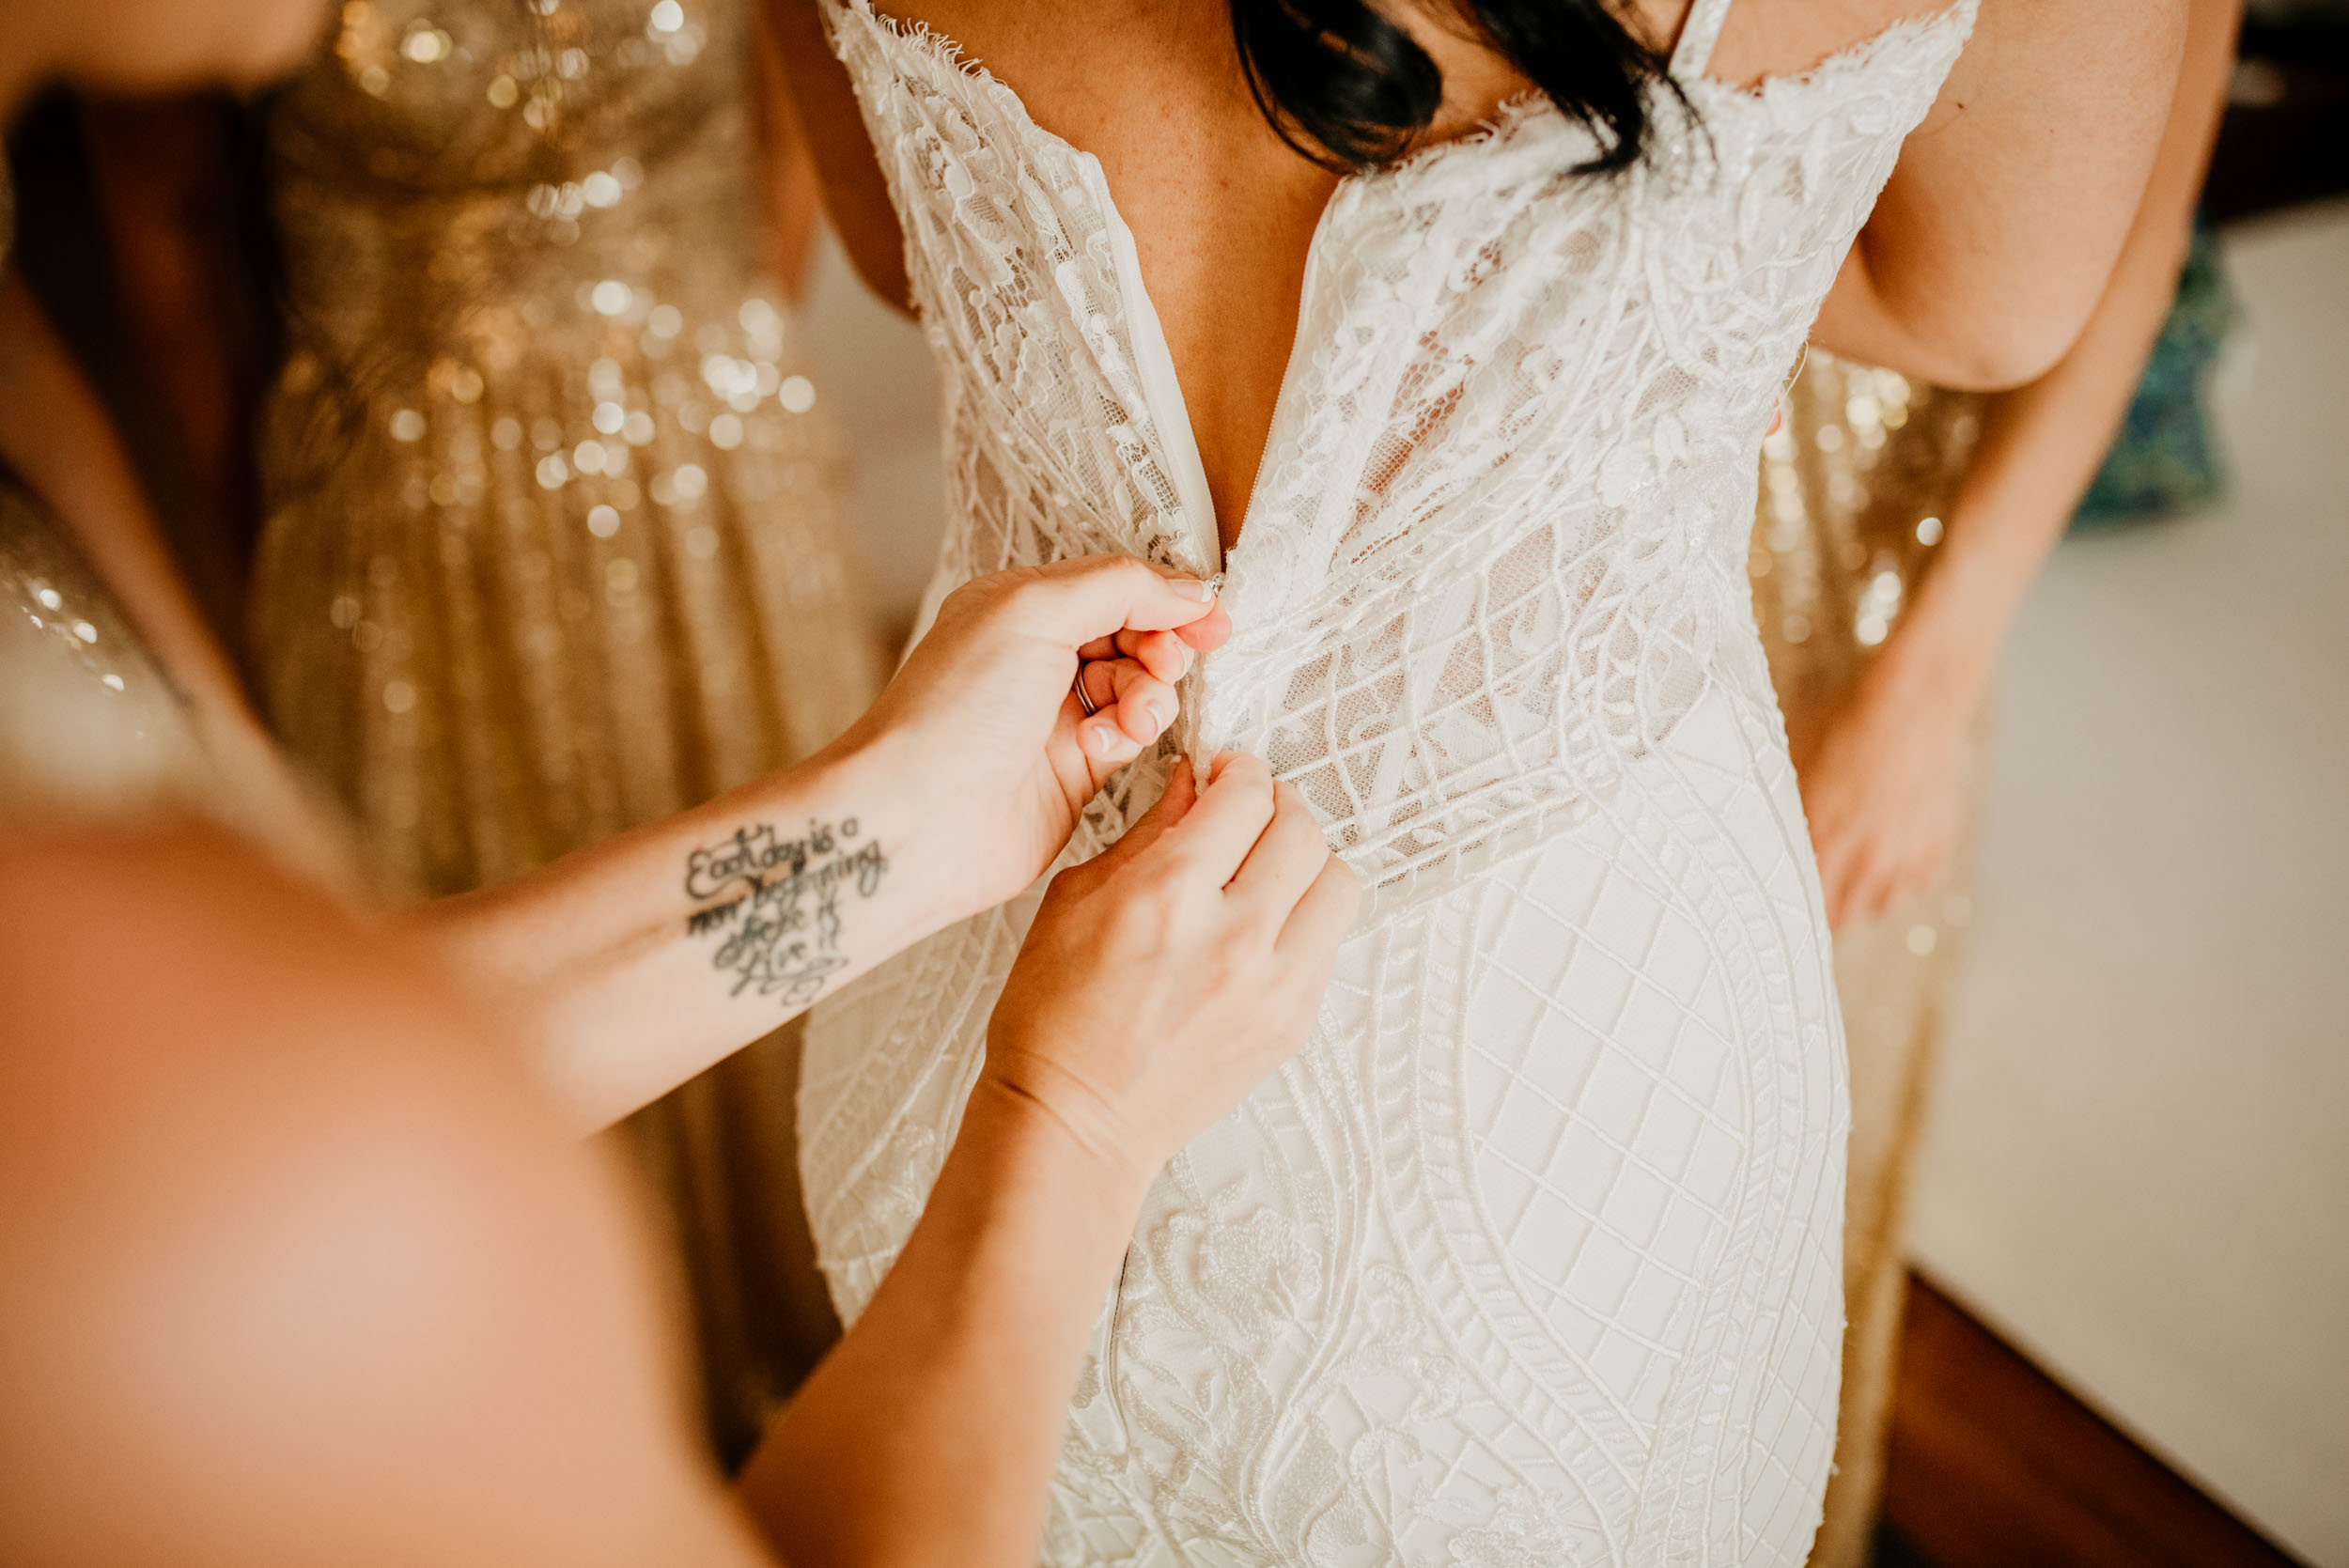 The Raw Photographer - Cairns Wedding Photographer - Beach Palm Cove Ceremony - Dress Irene Costa's Devine Bridal - Queensland-21.jpg